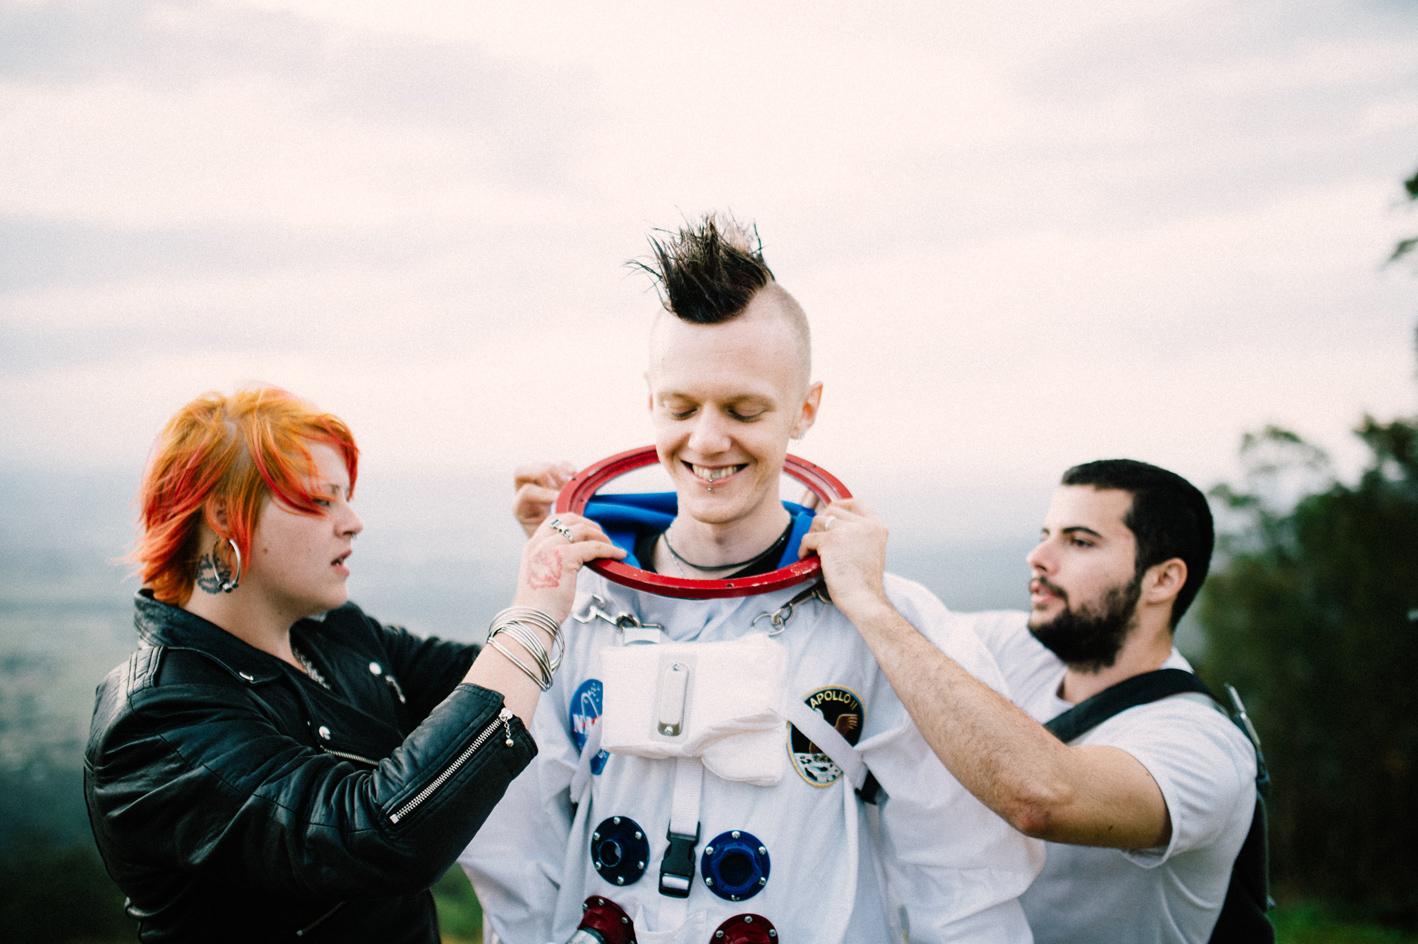 031-astronaut-amy-craig-mount-tamborine-sophie-baker-photography